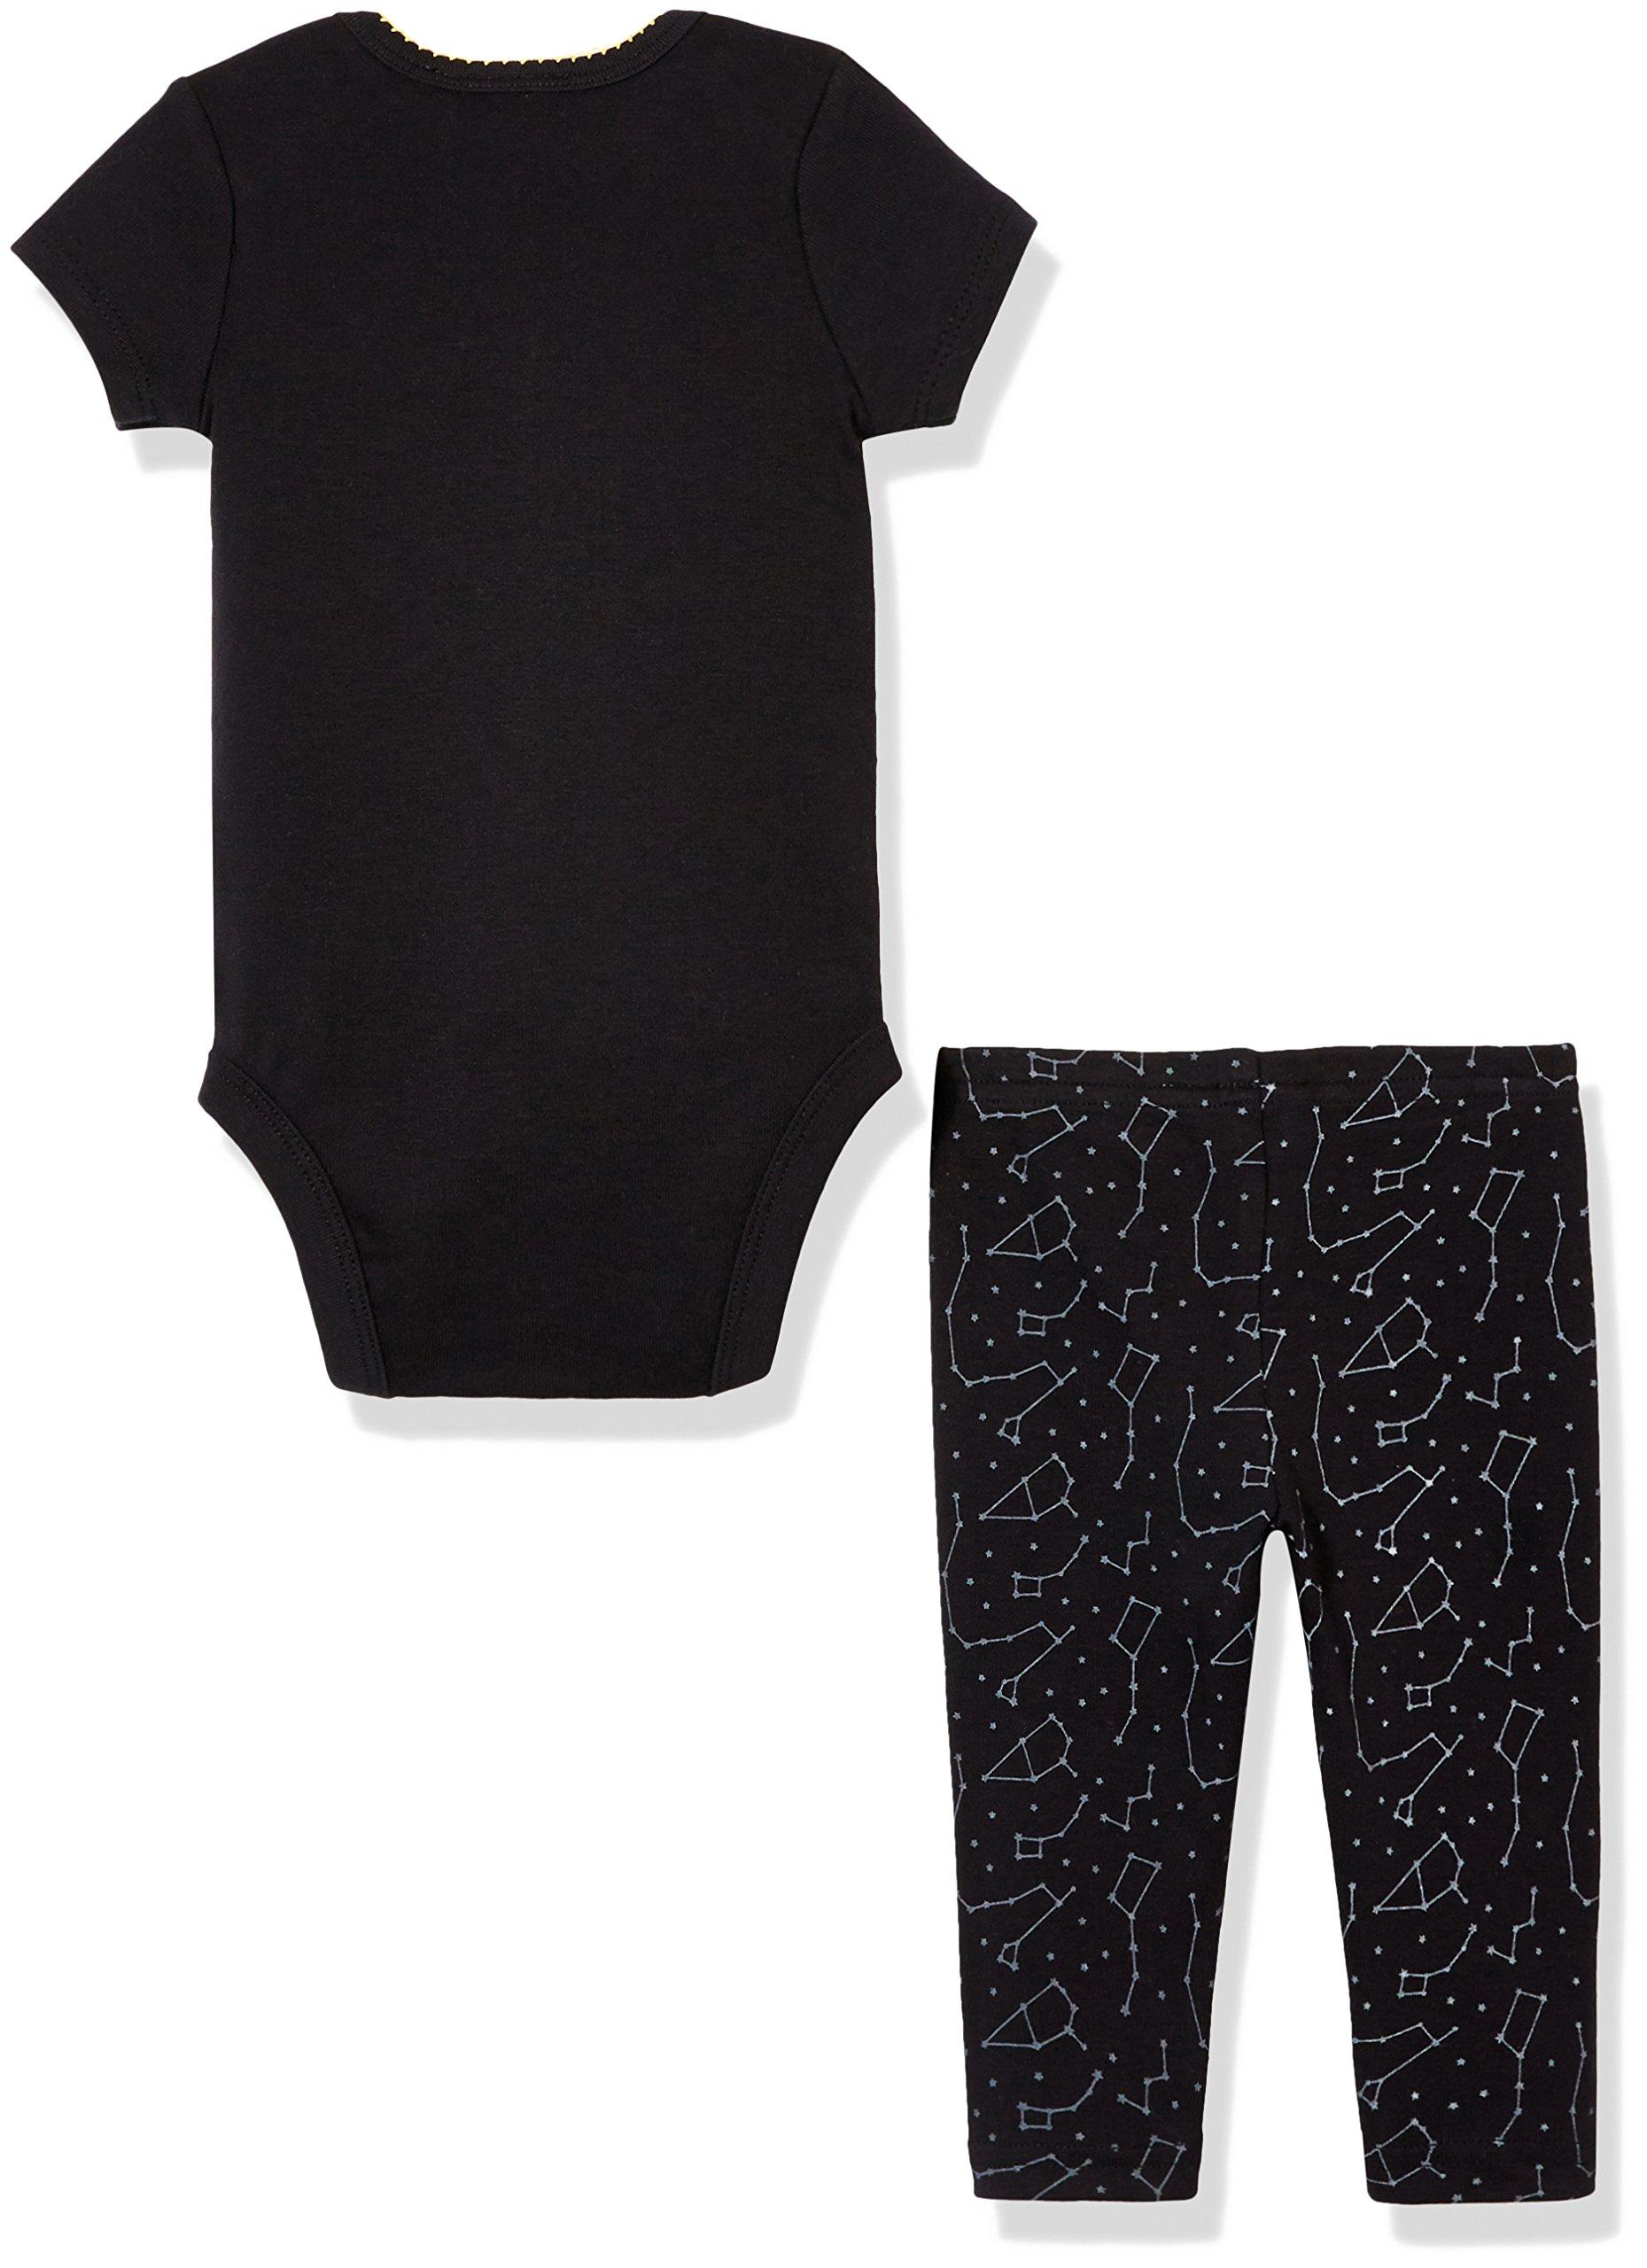 cdcc34aca Cute Baby Unisex 2-Piece Short-Sleeve Bodysuit Onesies and Pant ...